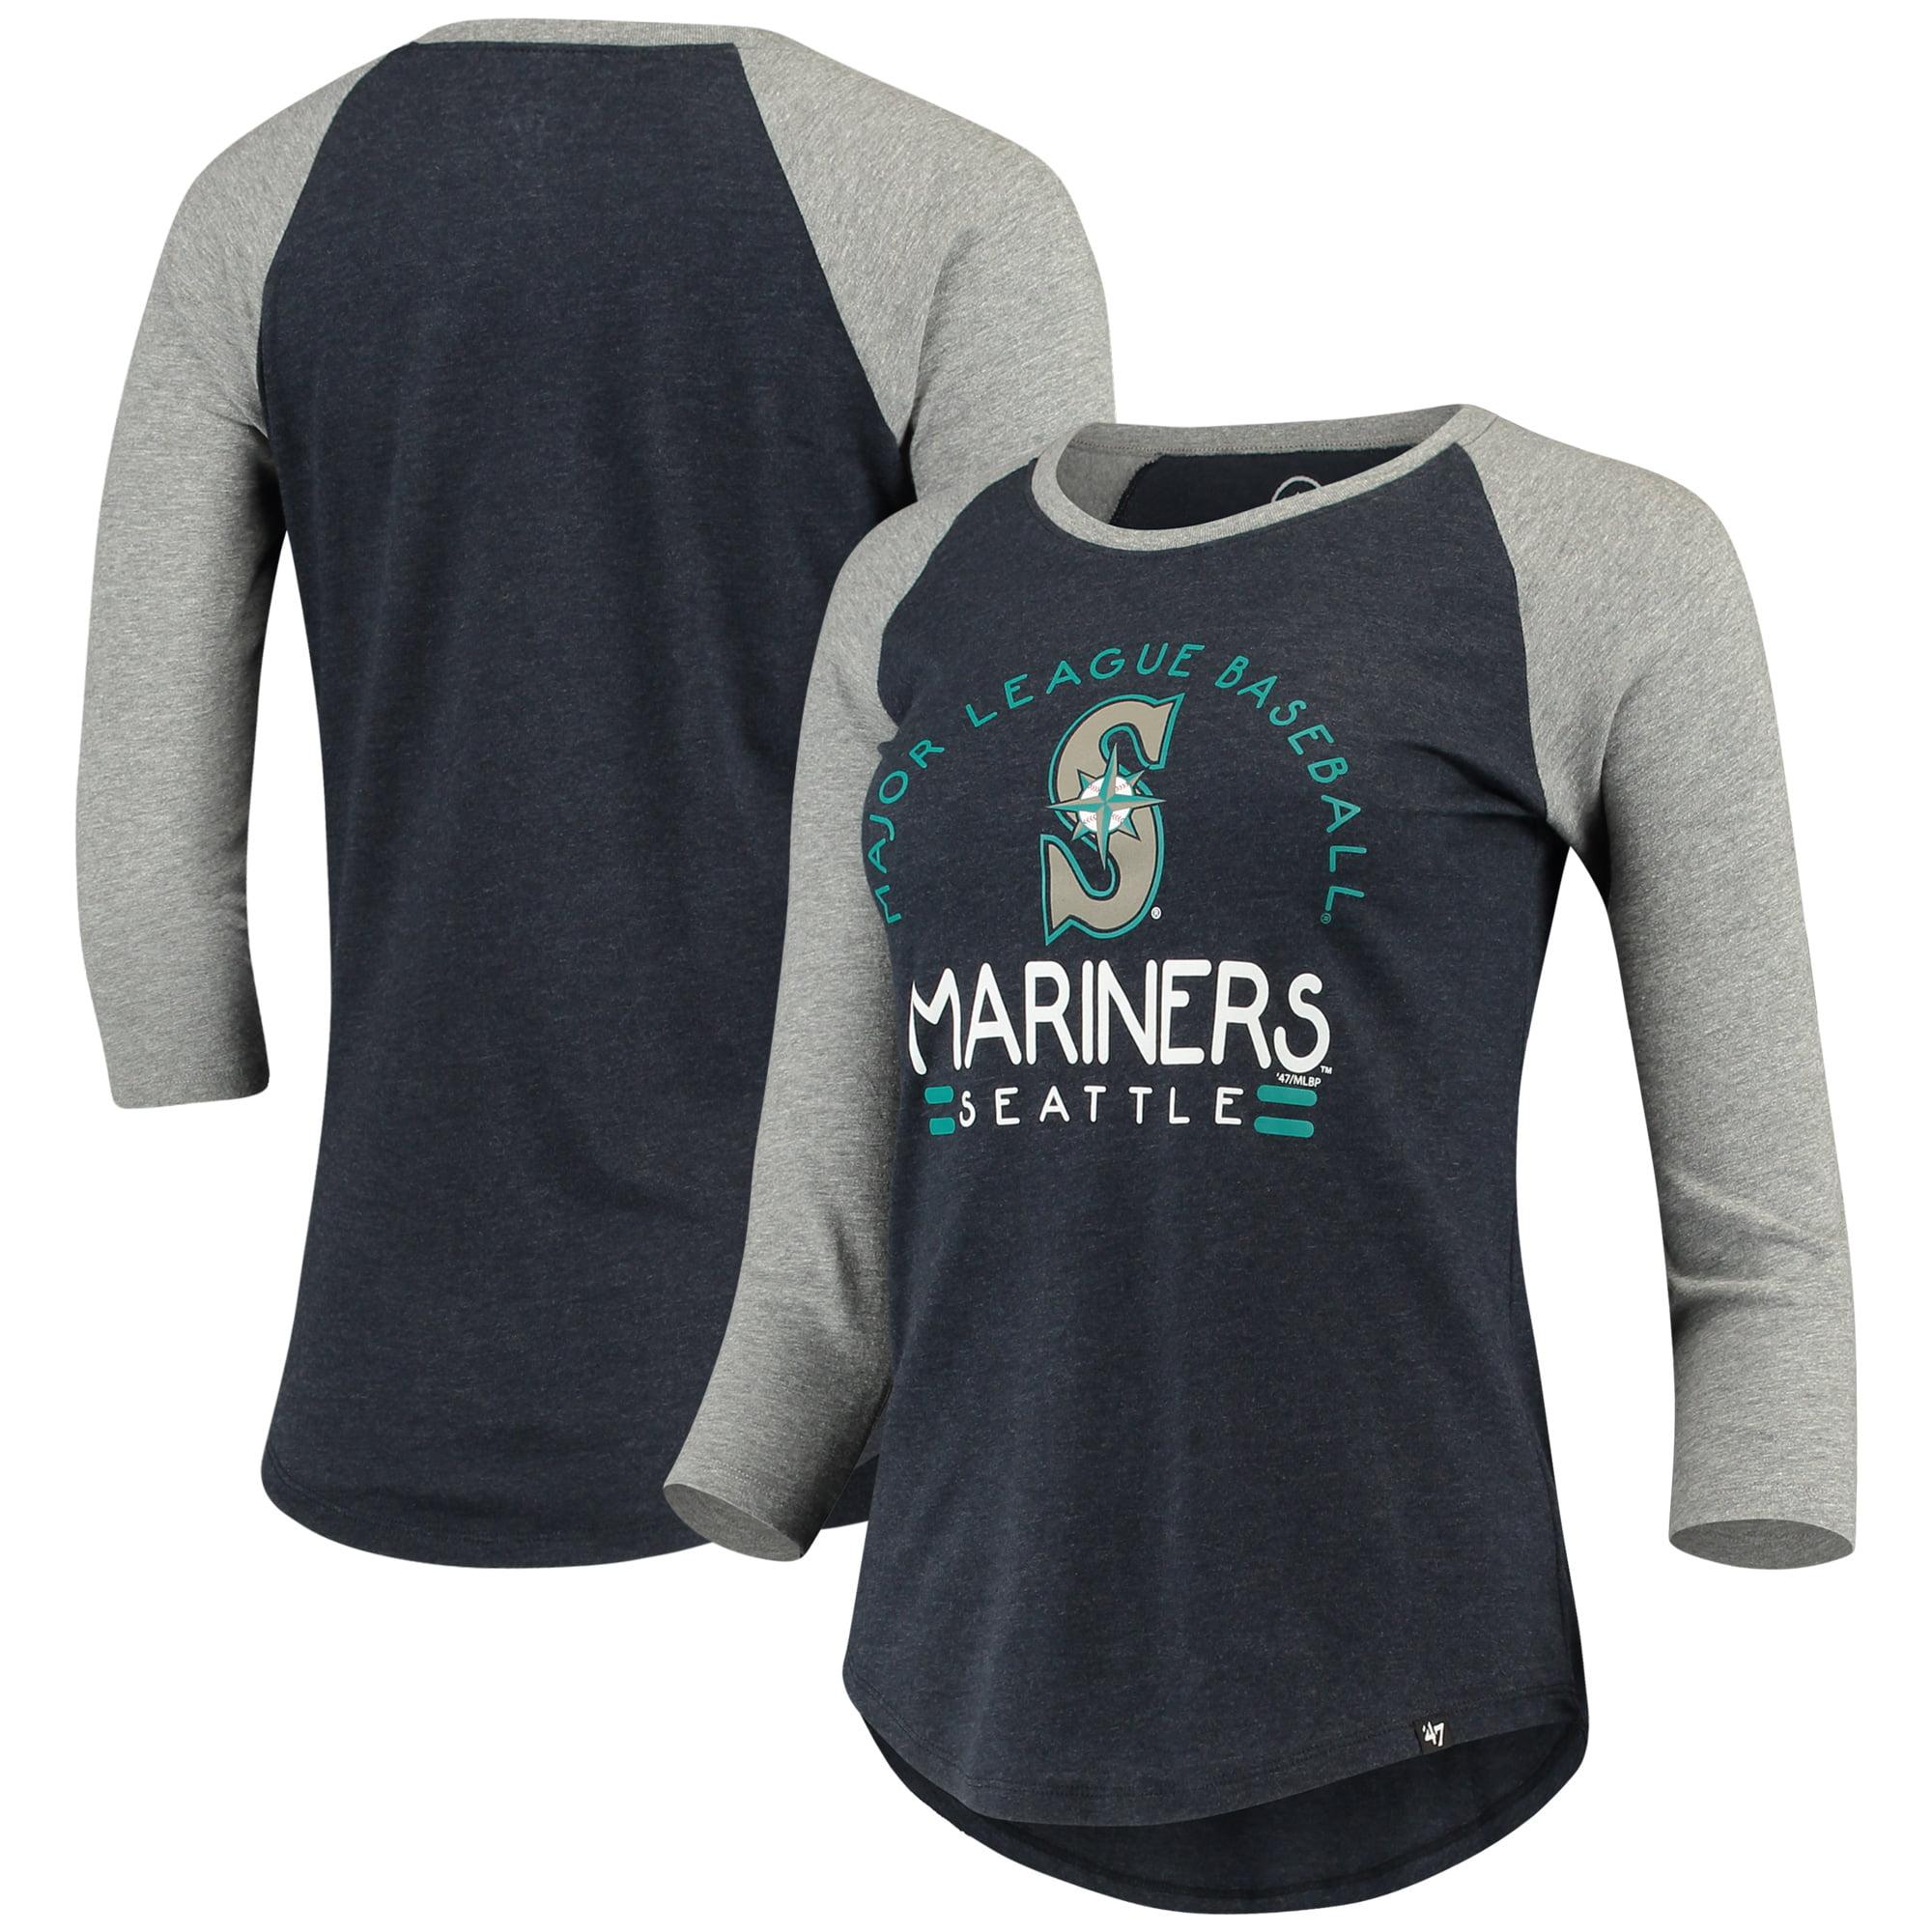 Seattle Mariners '47 Women's Club 3/4-Sleeve Raglan T-Shirt - Heathered Navy